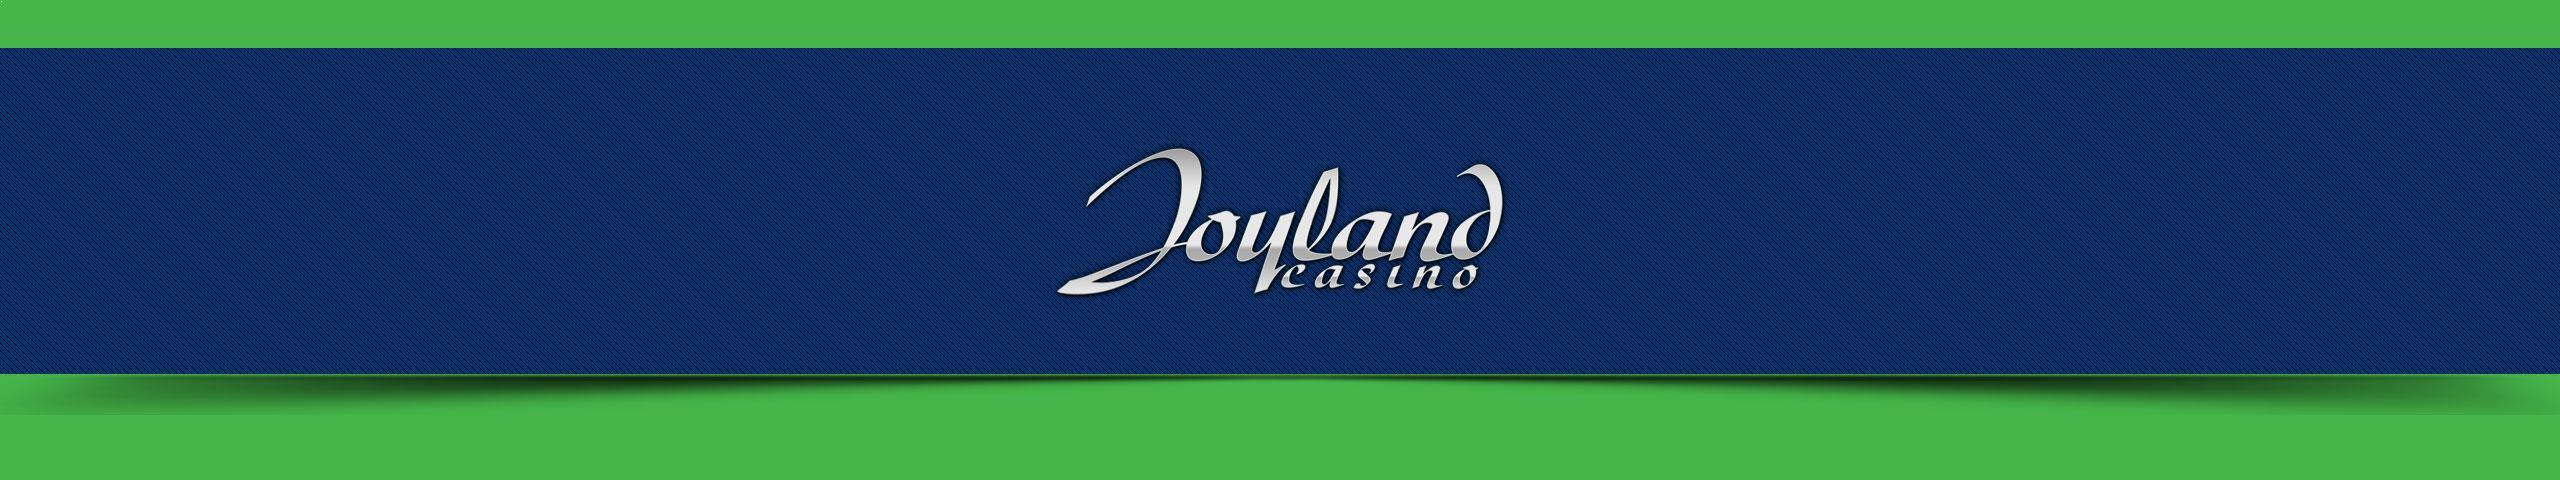 JoylandCasino Vizualizarea Casino-ului Casino Multa Bafta Slider